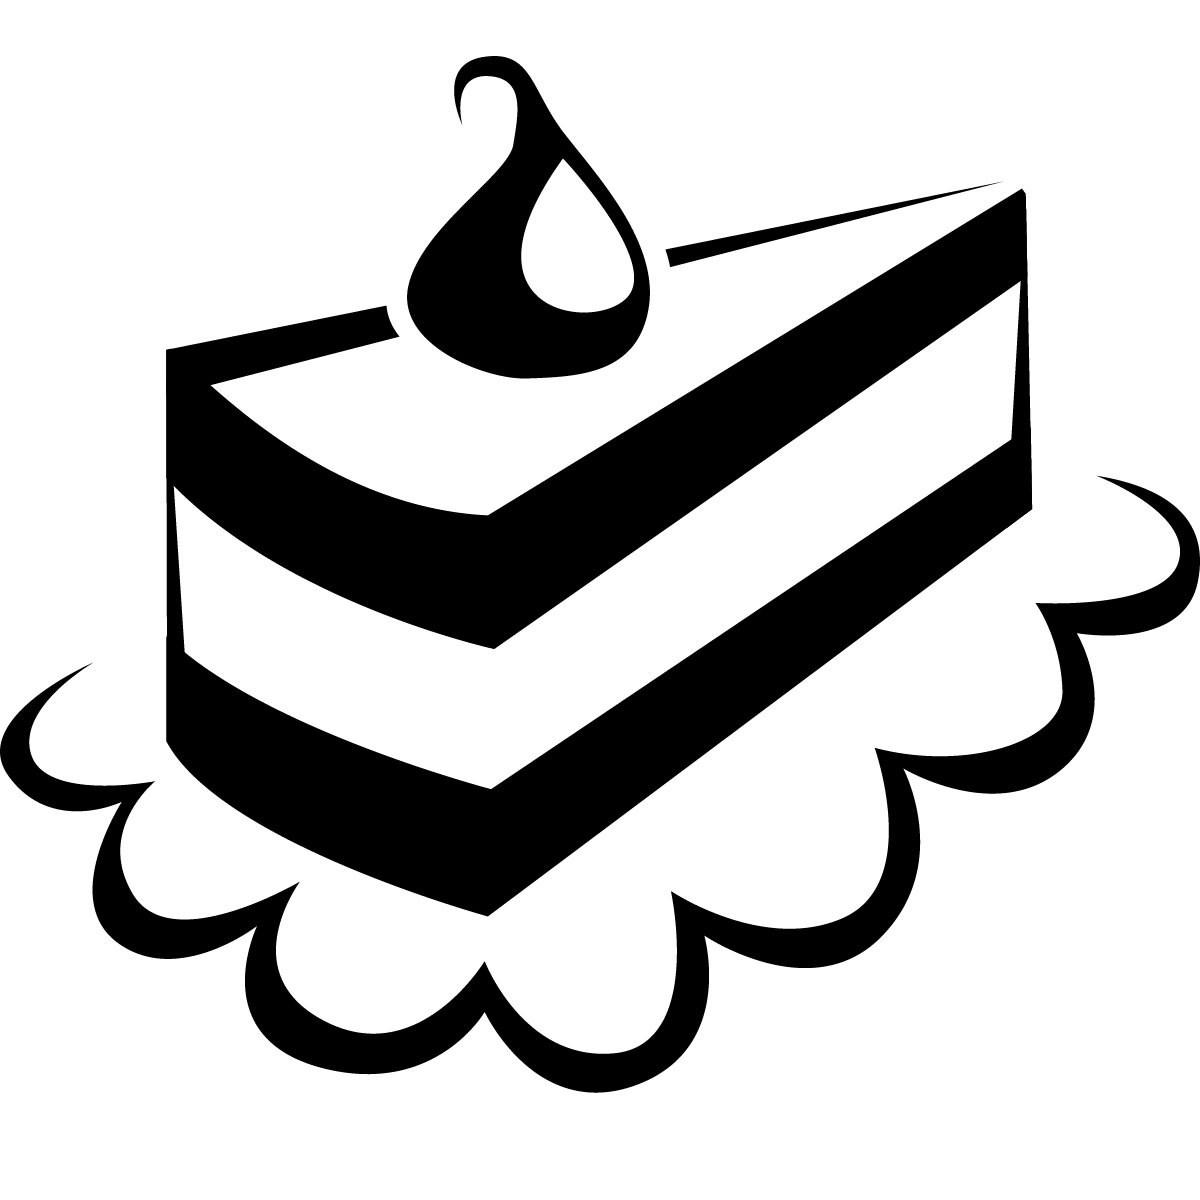 Cake clipart black and white. Slice of clip art